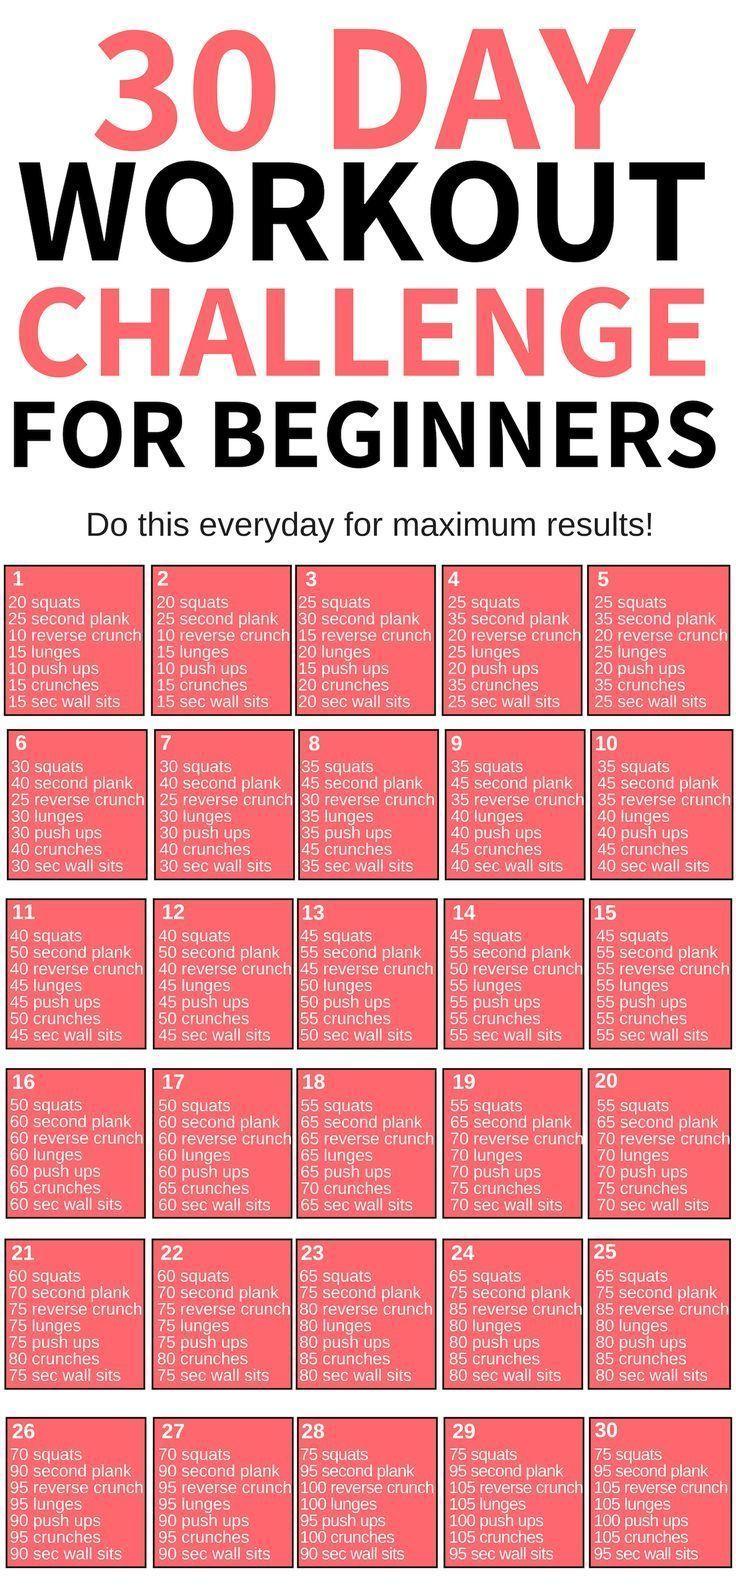 30 Day Workout Challenge 30 Day Workout Challenge Workout